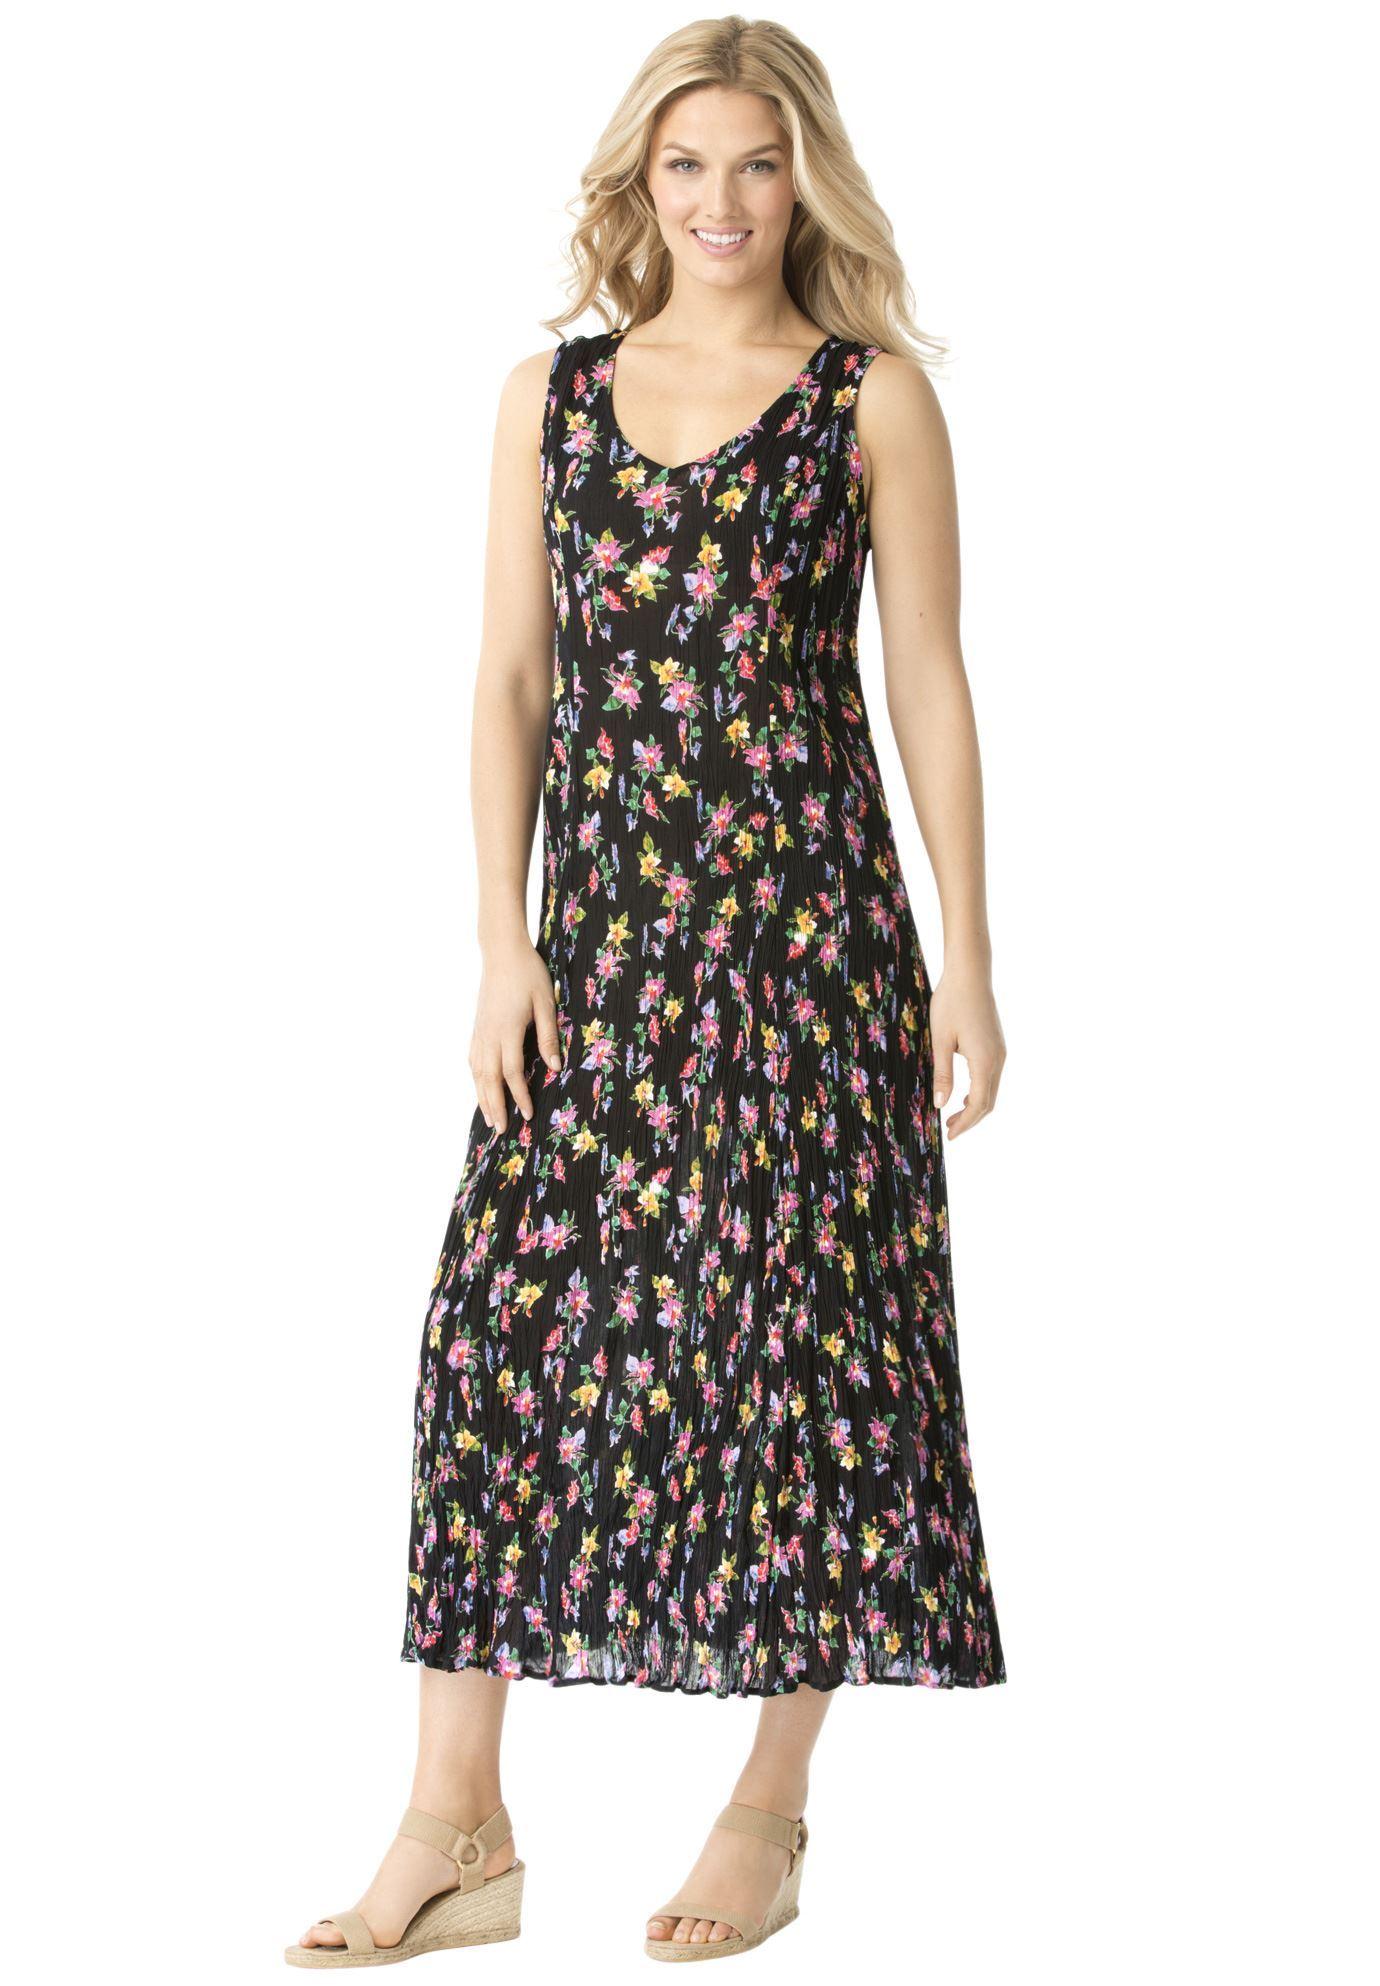 425c9cbd080 http   www.womanwithin.com clothing Woman-WithinandregSleeveless-